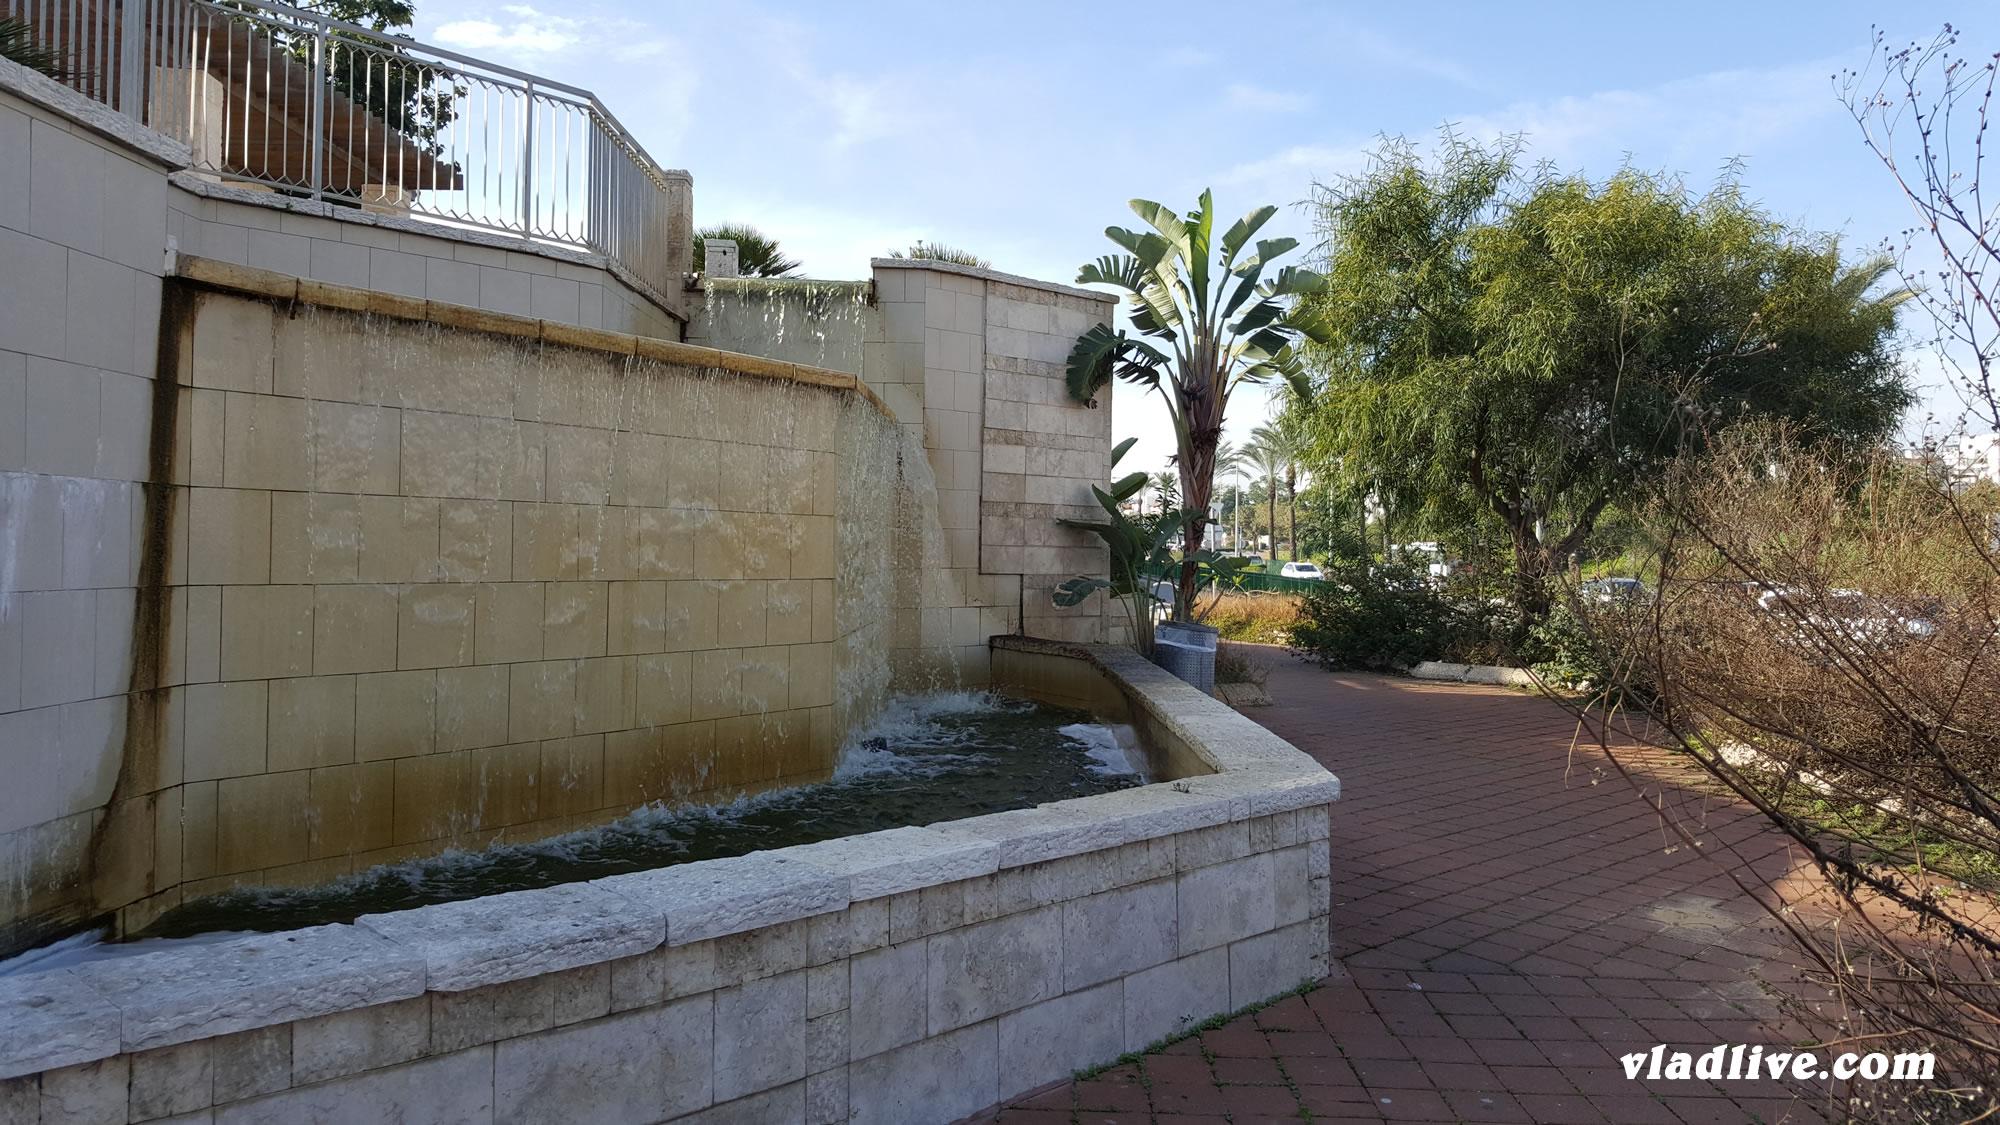 Лечение в Израиле. Обман и Мошенничество.